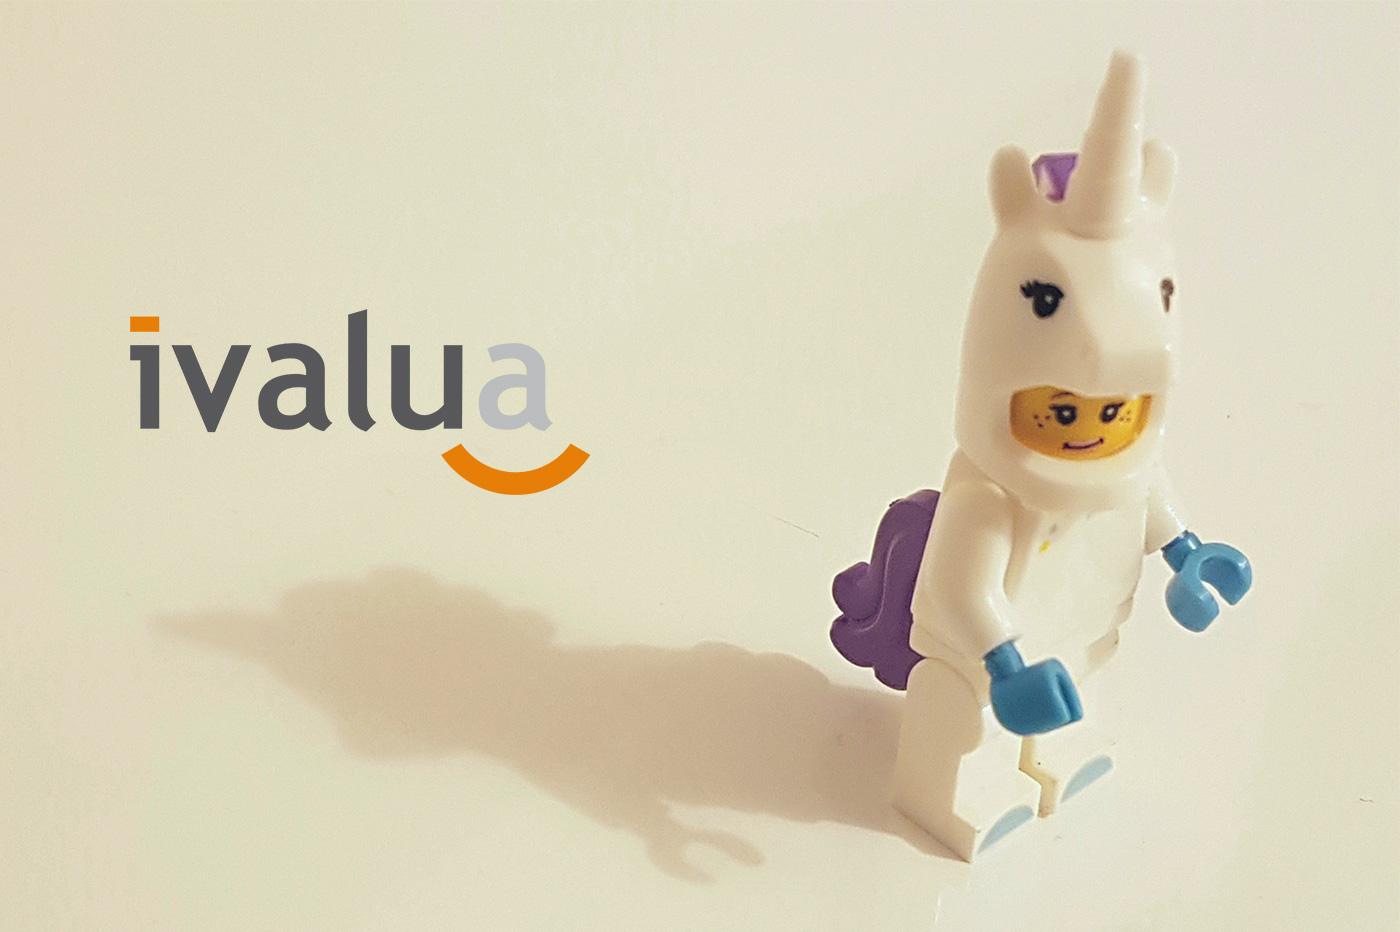 Ivalua startup licorne